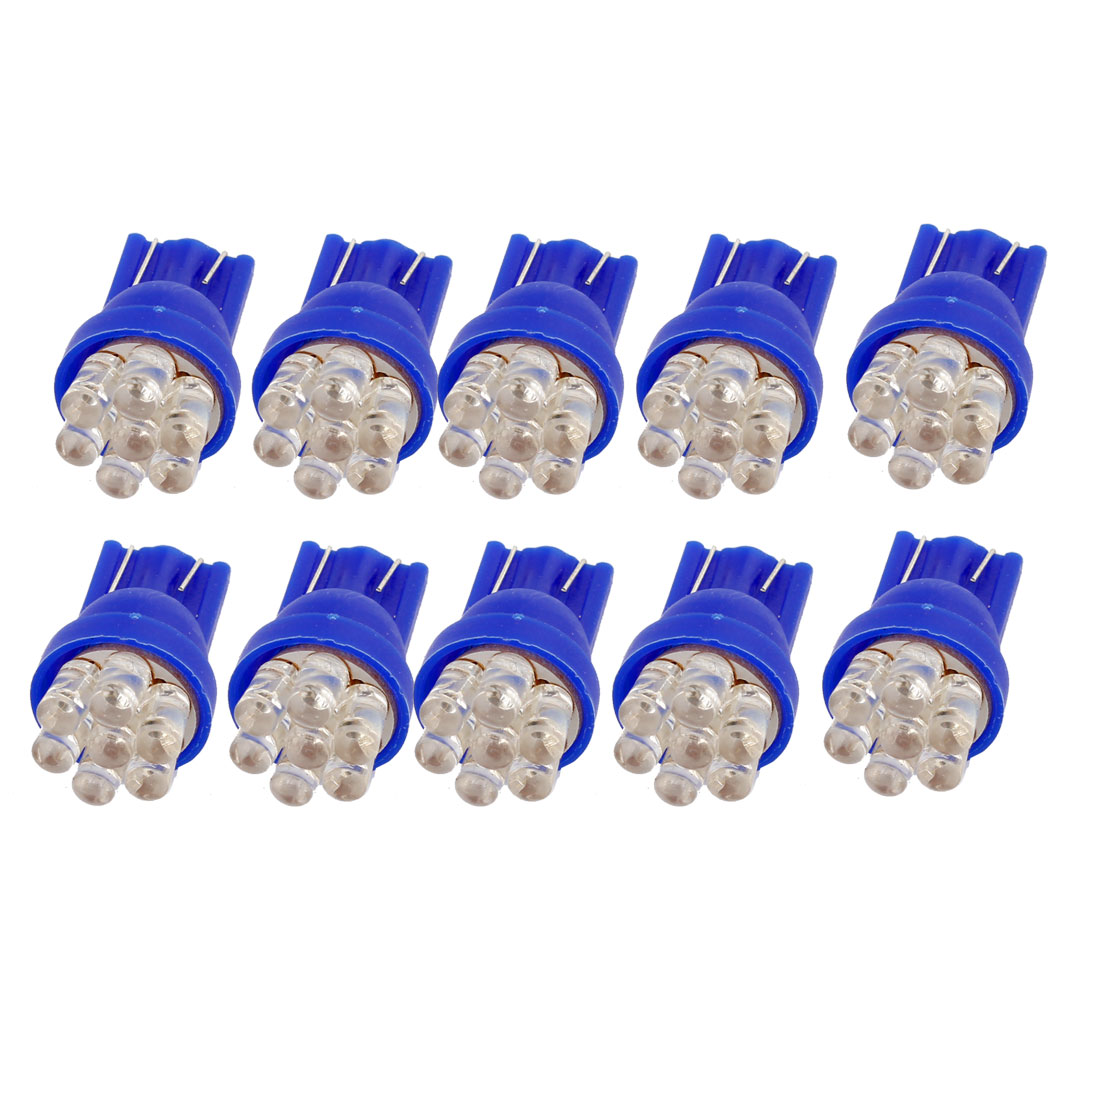 10 Pcs Blue 7-LED T10 194 921 W5W Side Wedge Light License Plate Lamp Bulbs